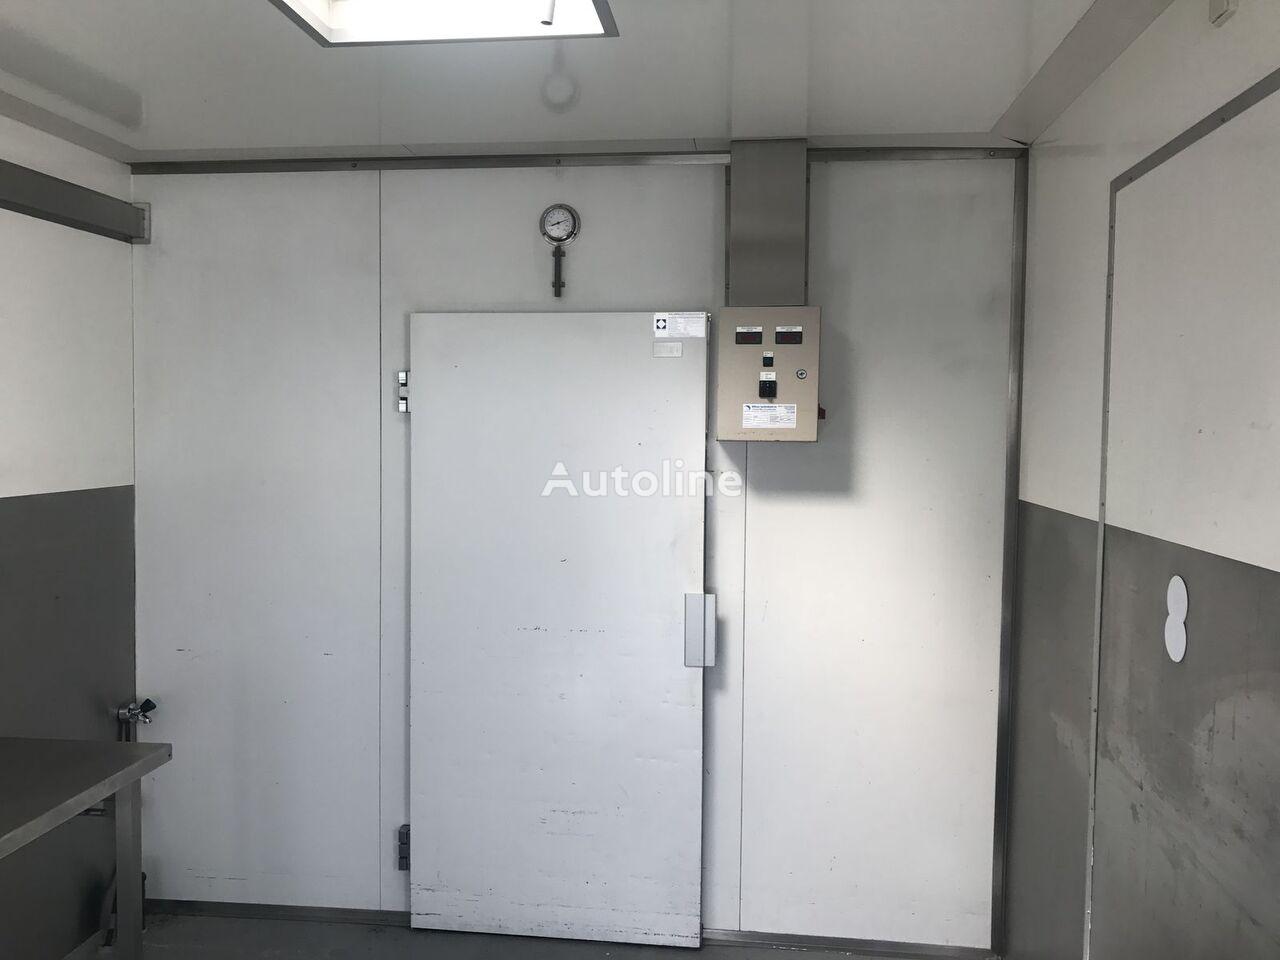 20-čeveljski hladilni zabojnik Willems koeltechniek bv